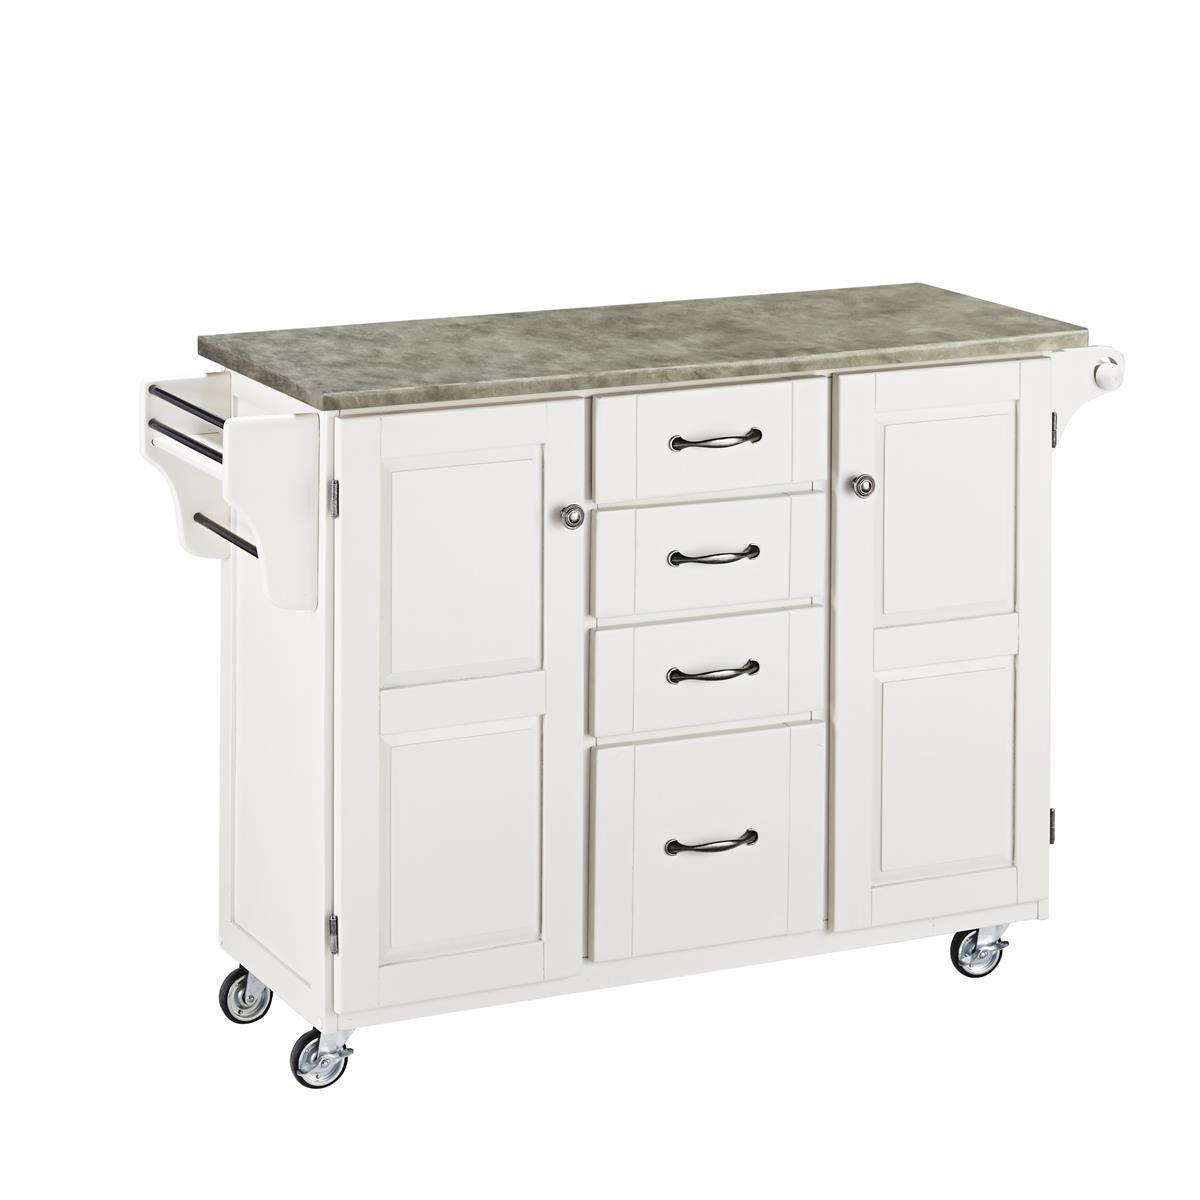 Nexera 2 Door Mobile Microwave Cart: Home Styles 9100-1211 Create-a-cart White 2 Door Cabinet